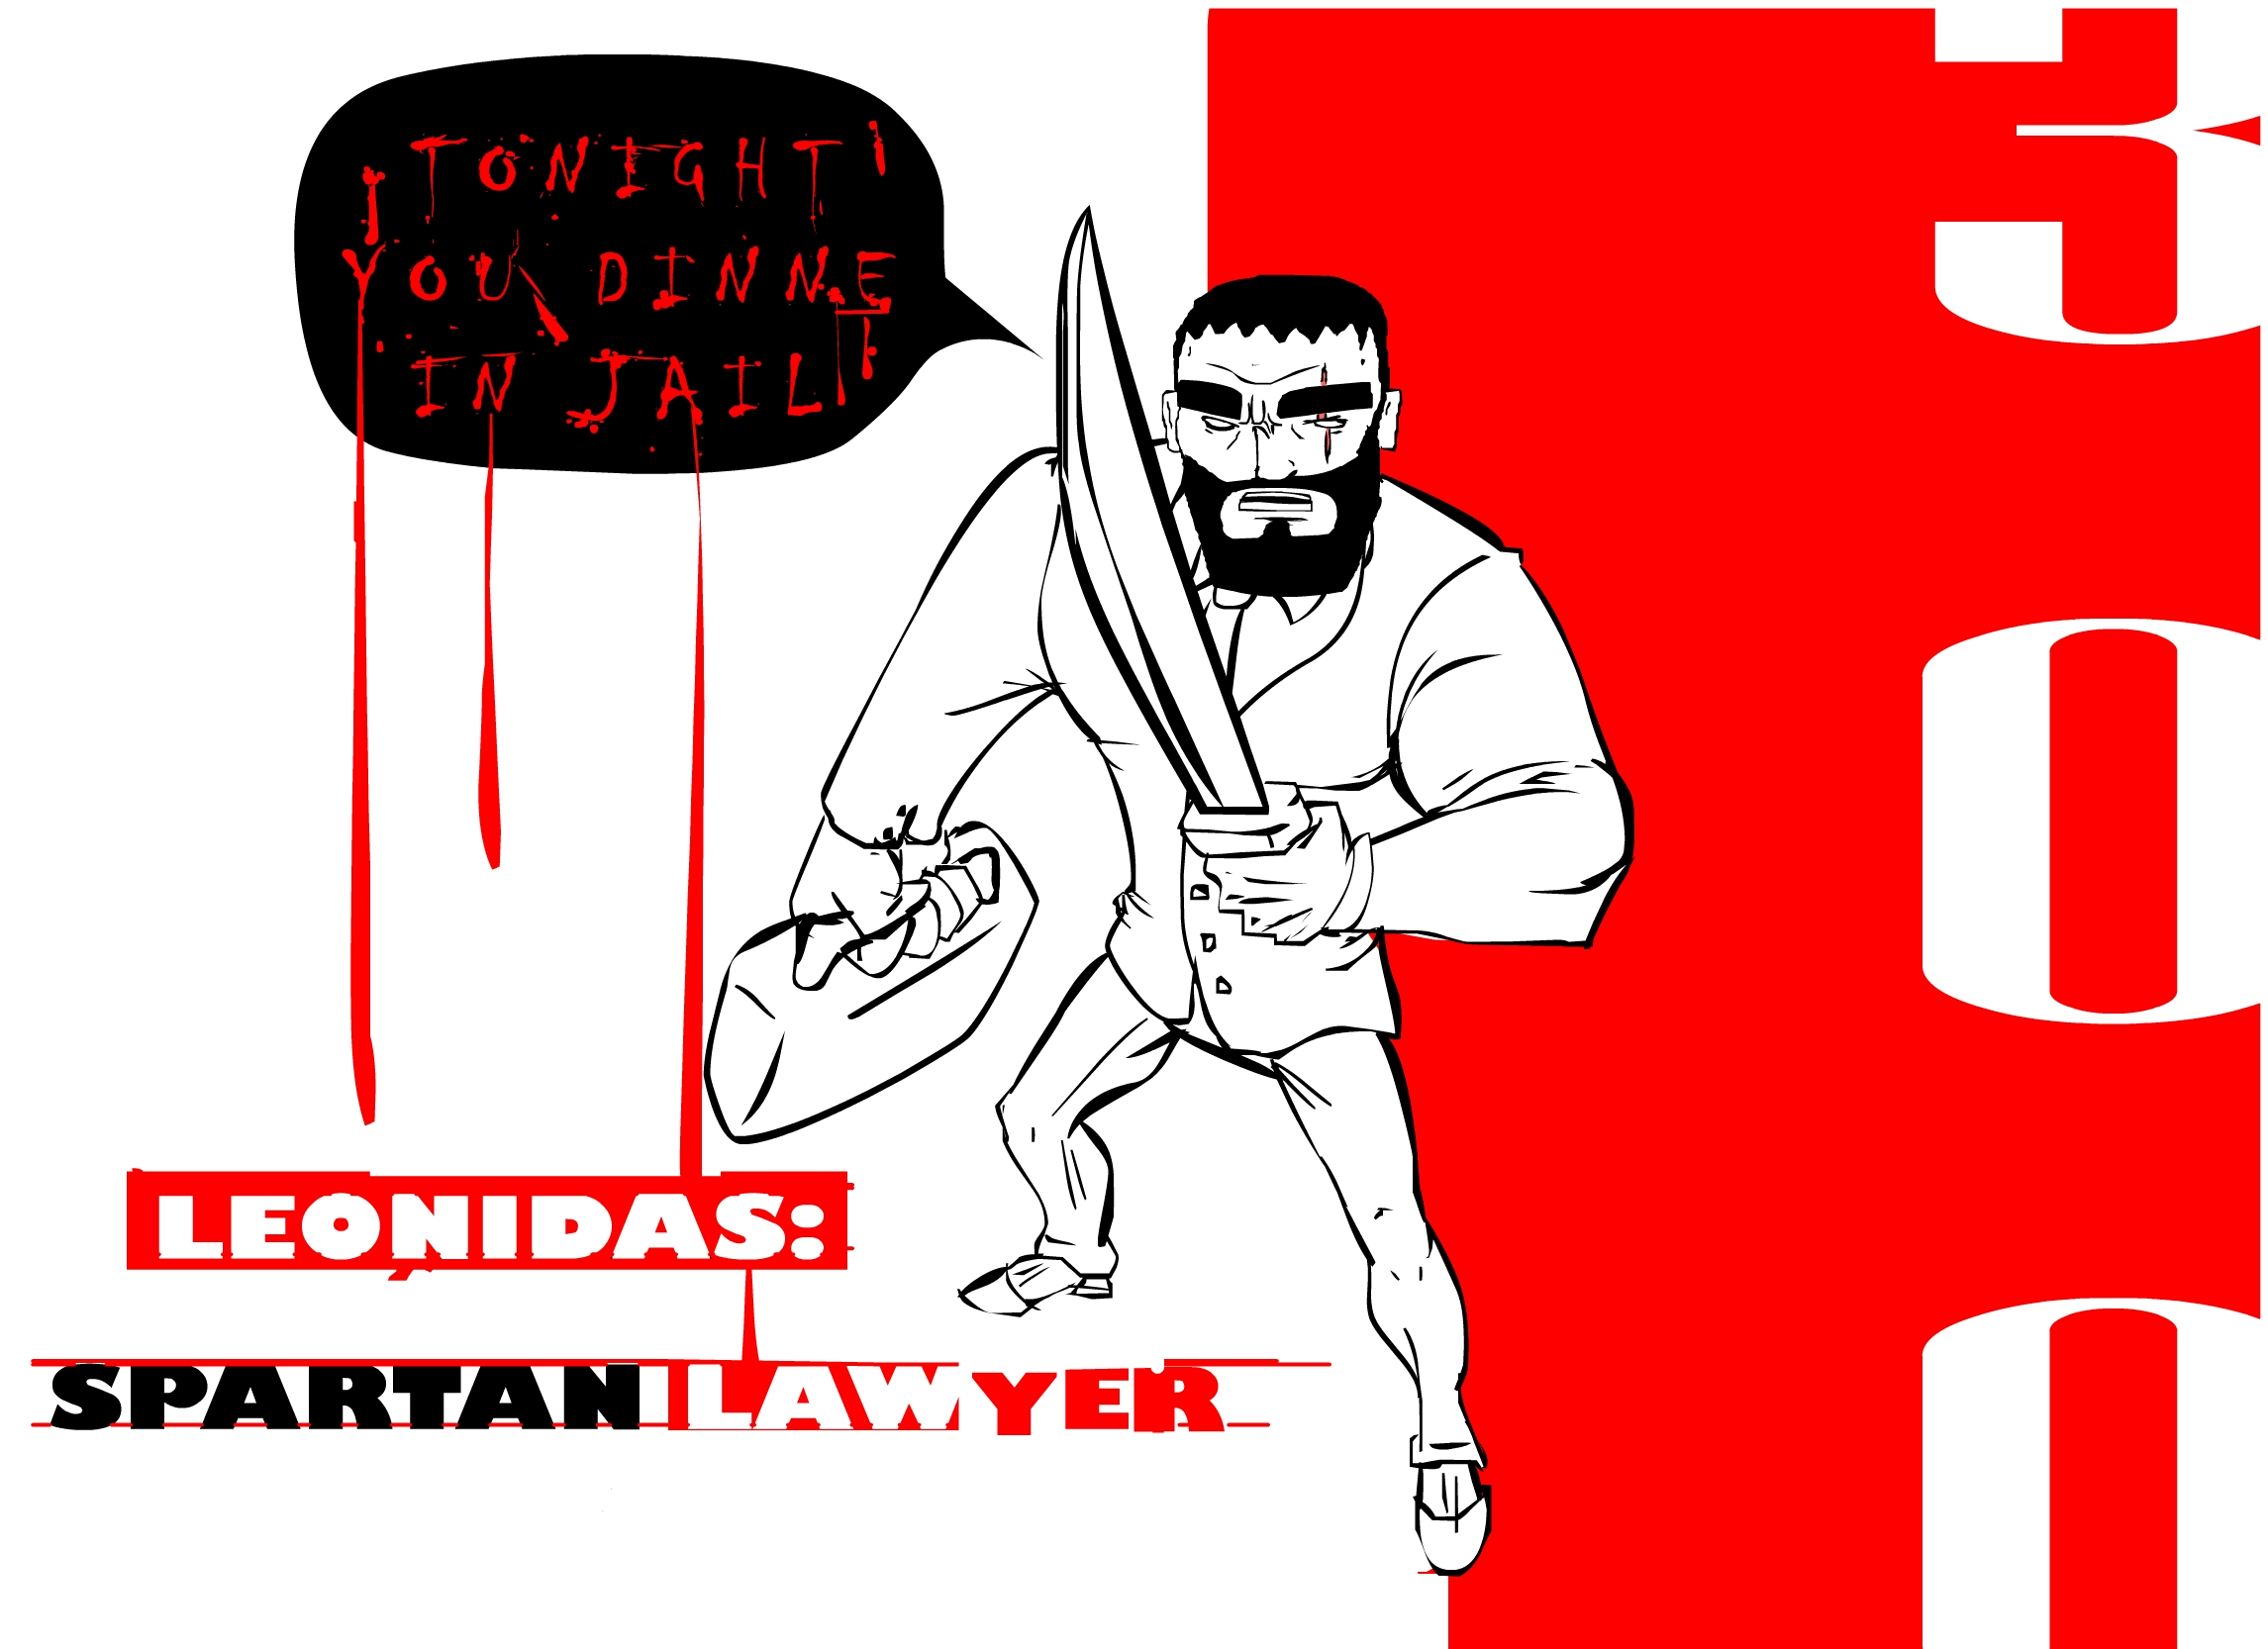 leonidas spartan lawyer